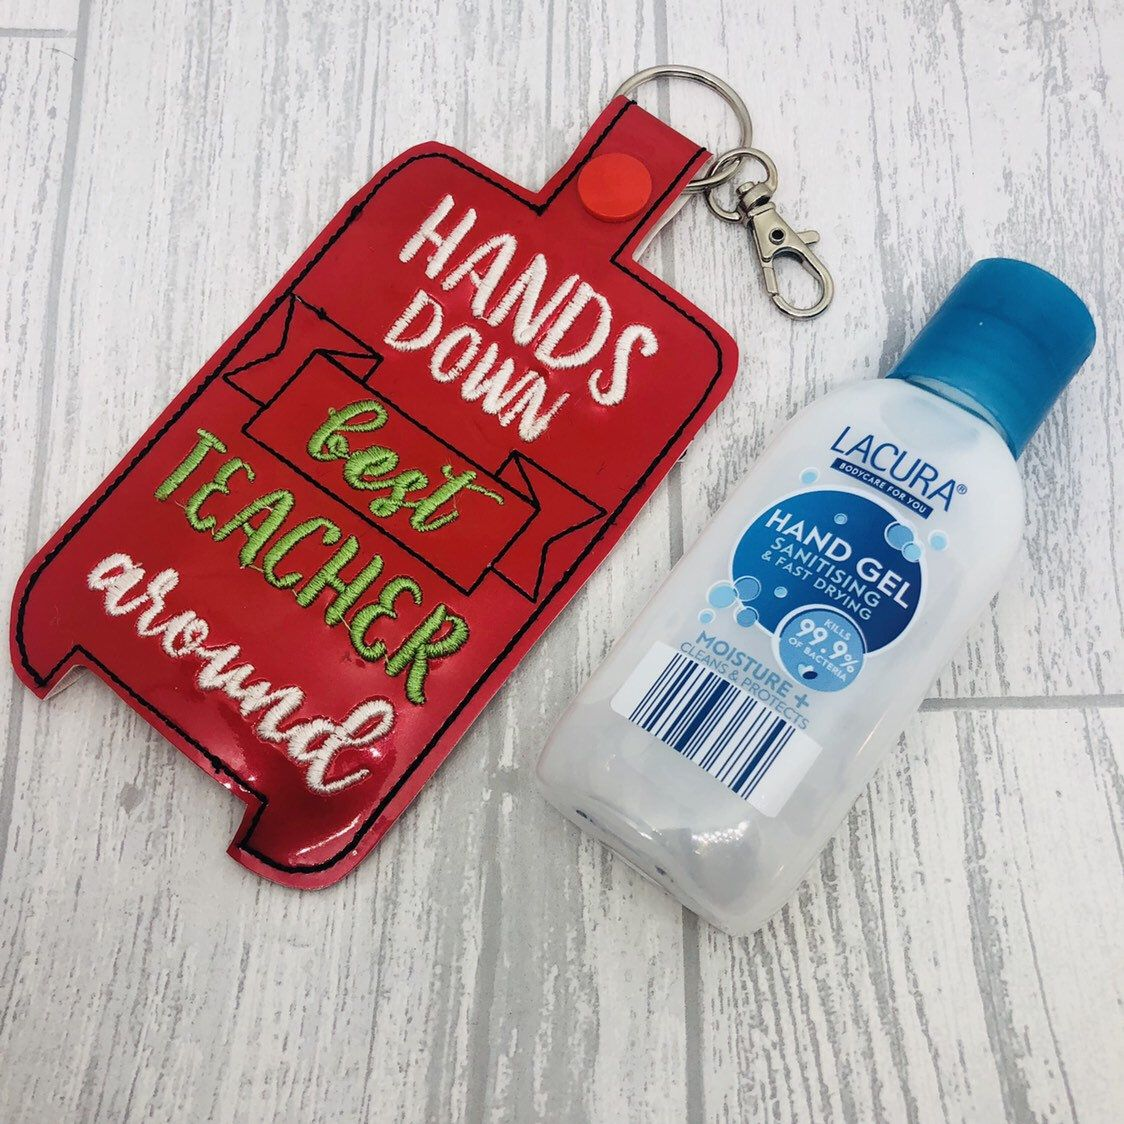 Sheep Hand Sanitizer Holder Keychain 1 Ounce Sanitizer Holder